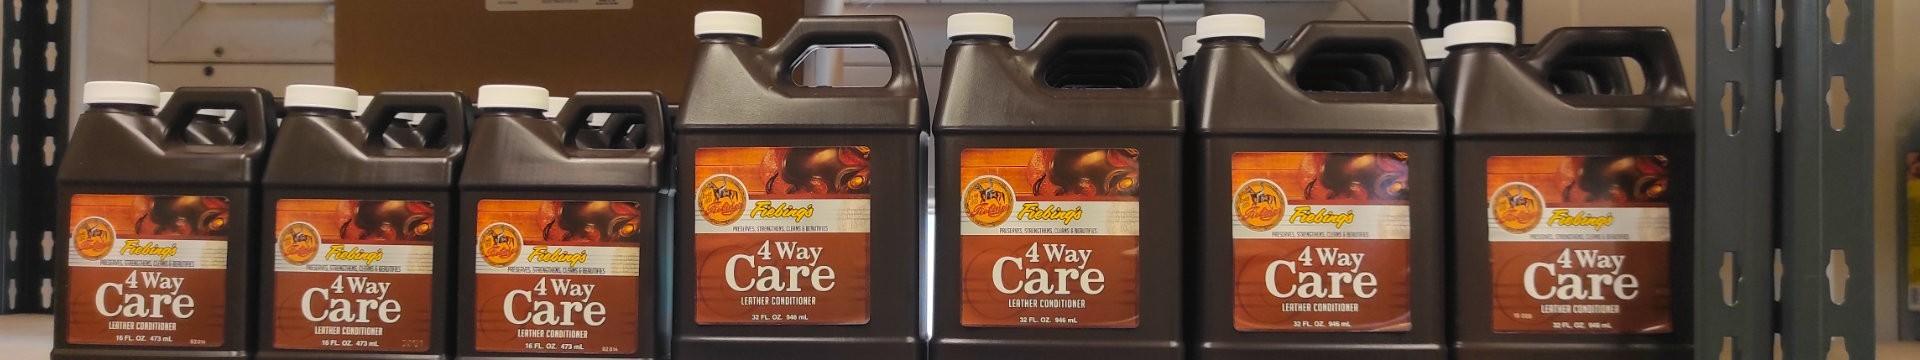 4 Way Care